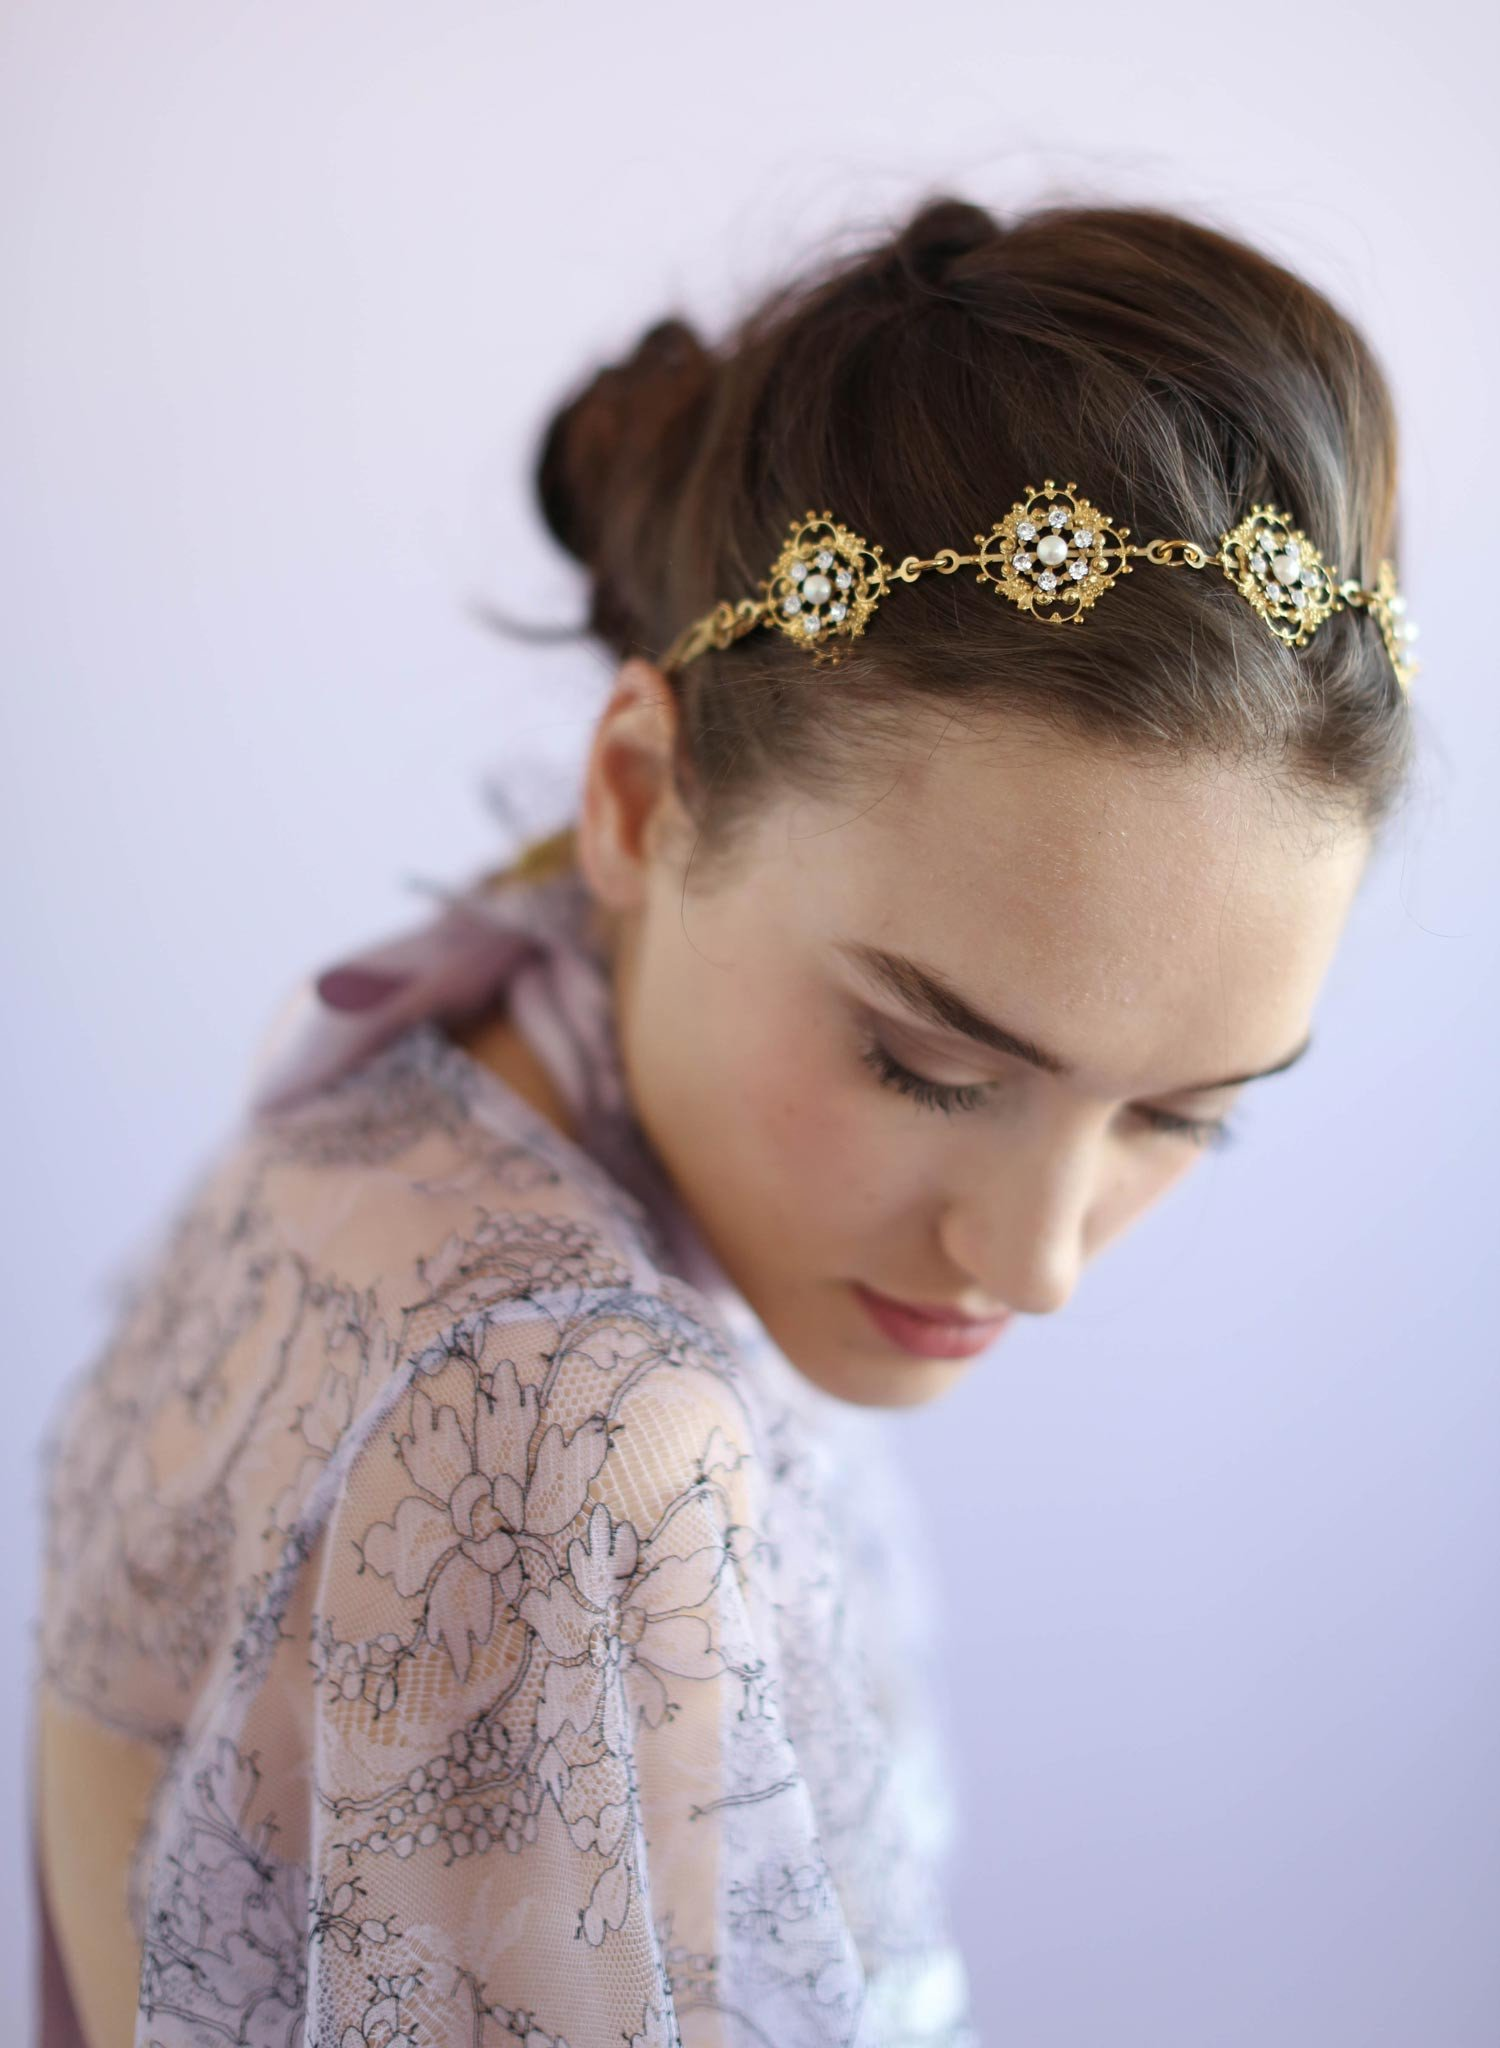 641-Victorian-inspired-decadent-headband11_MAIN.jpg